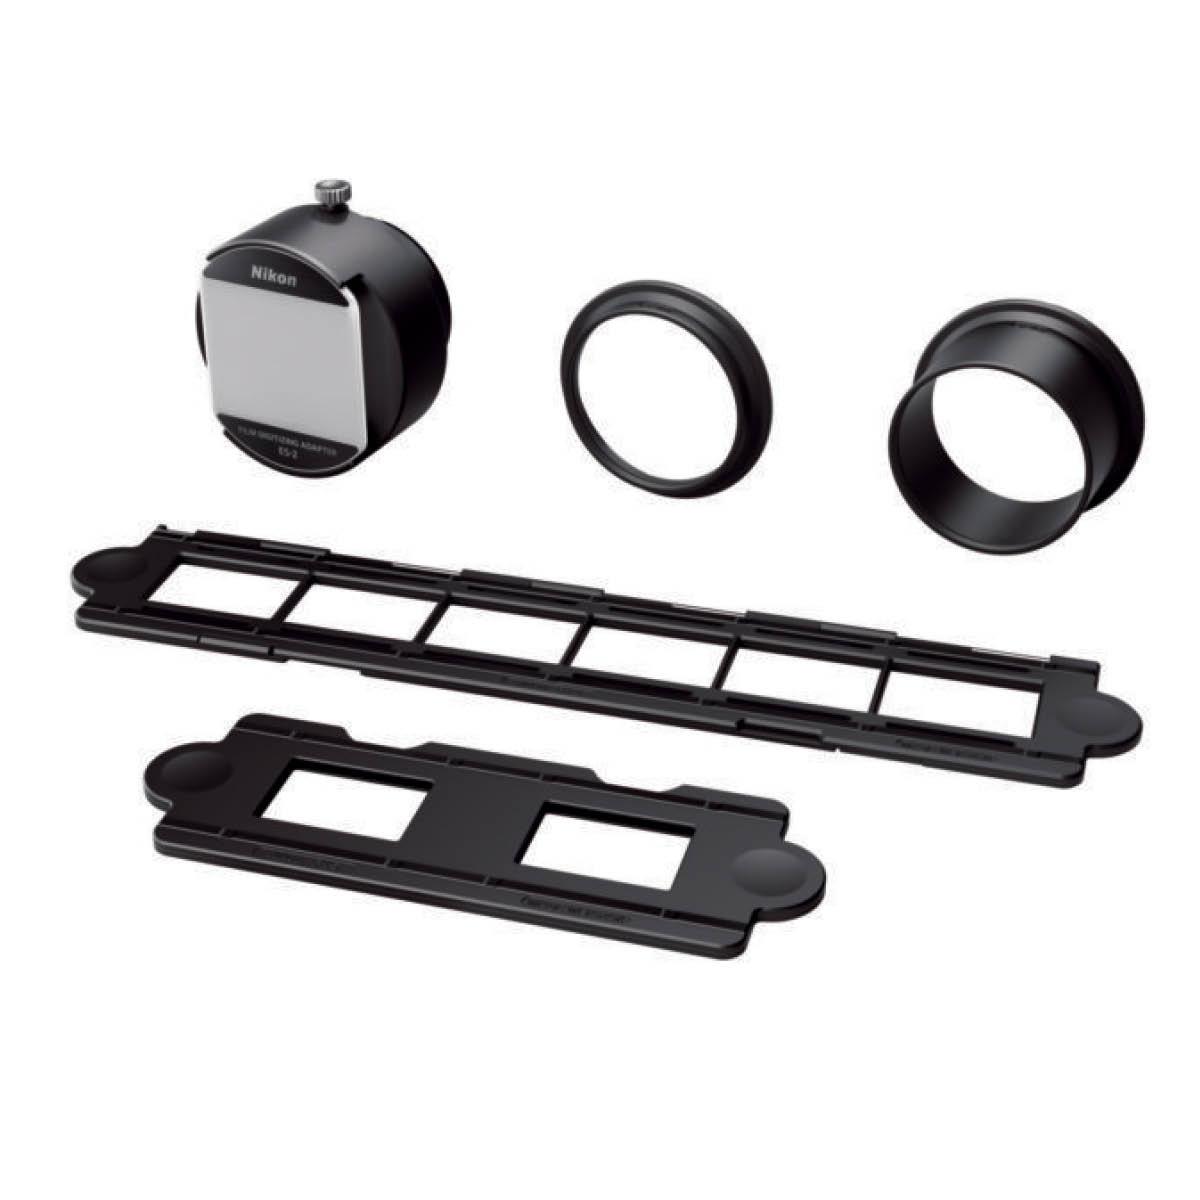 Nikon Film-Digitalisierungsadapter ES 2 Set